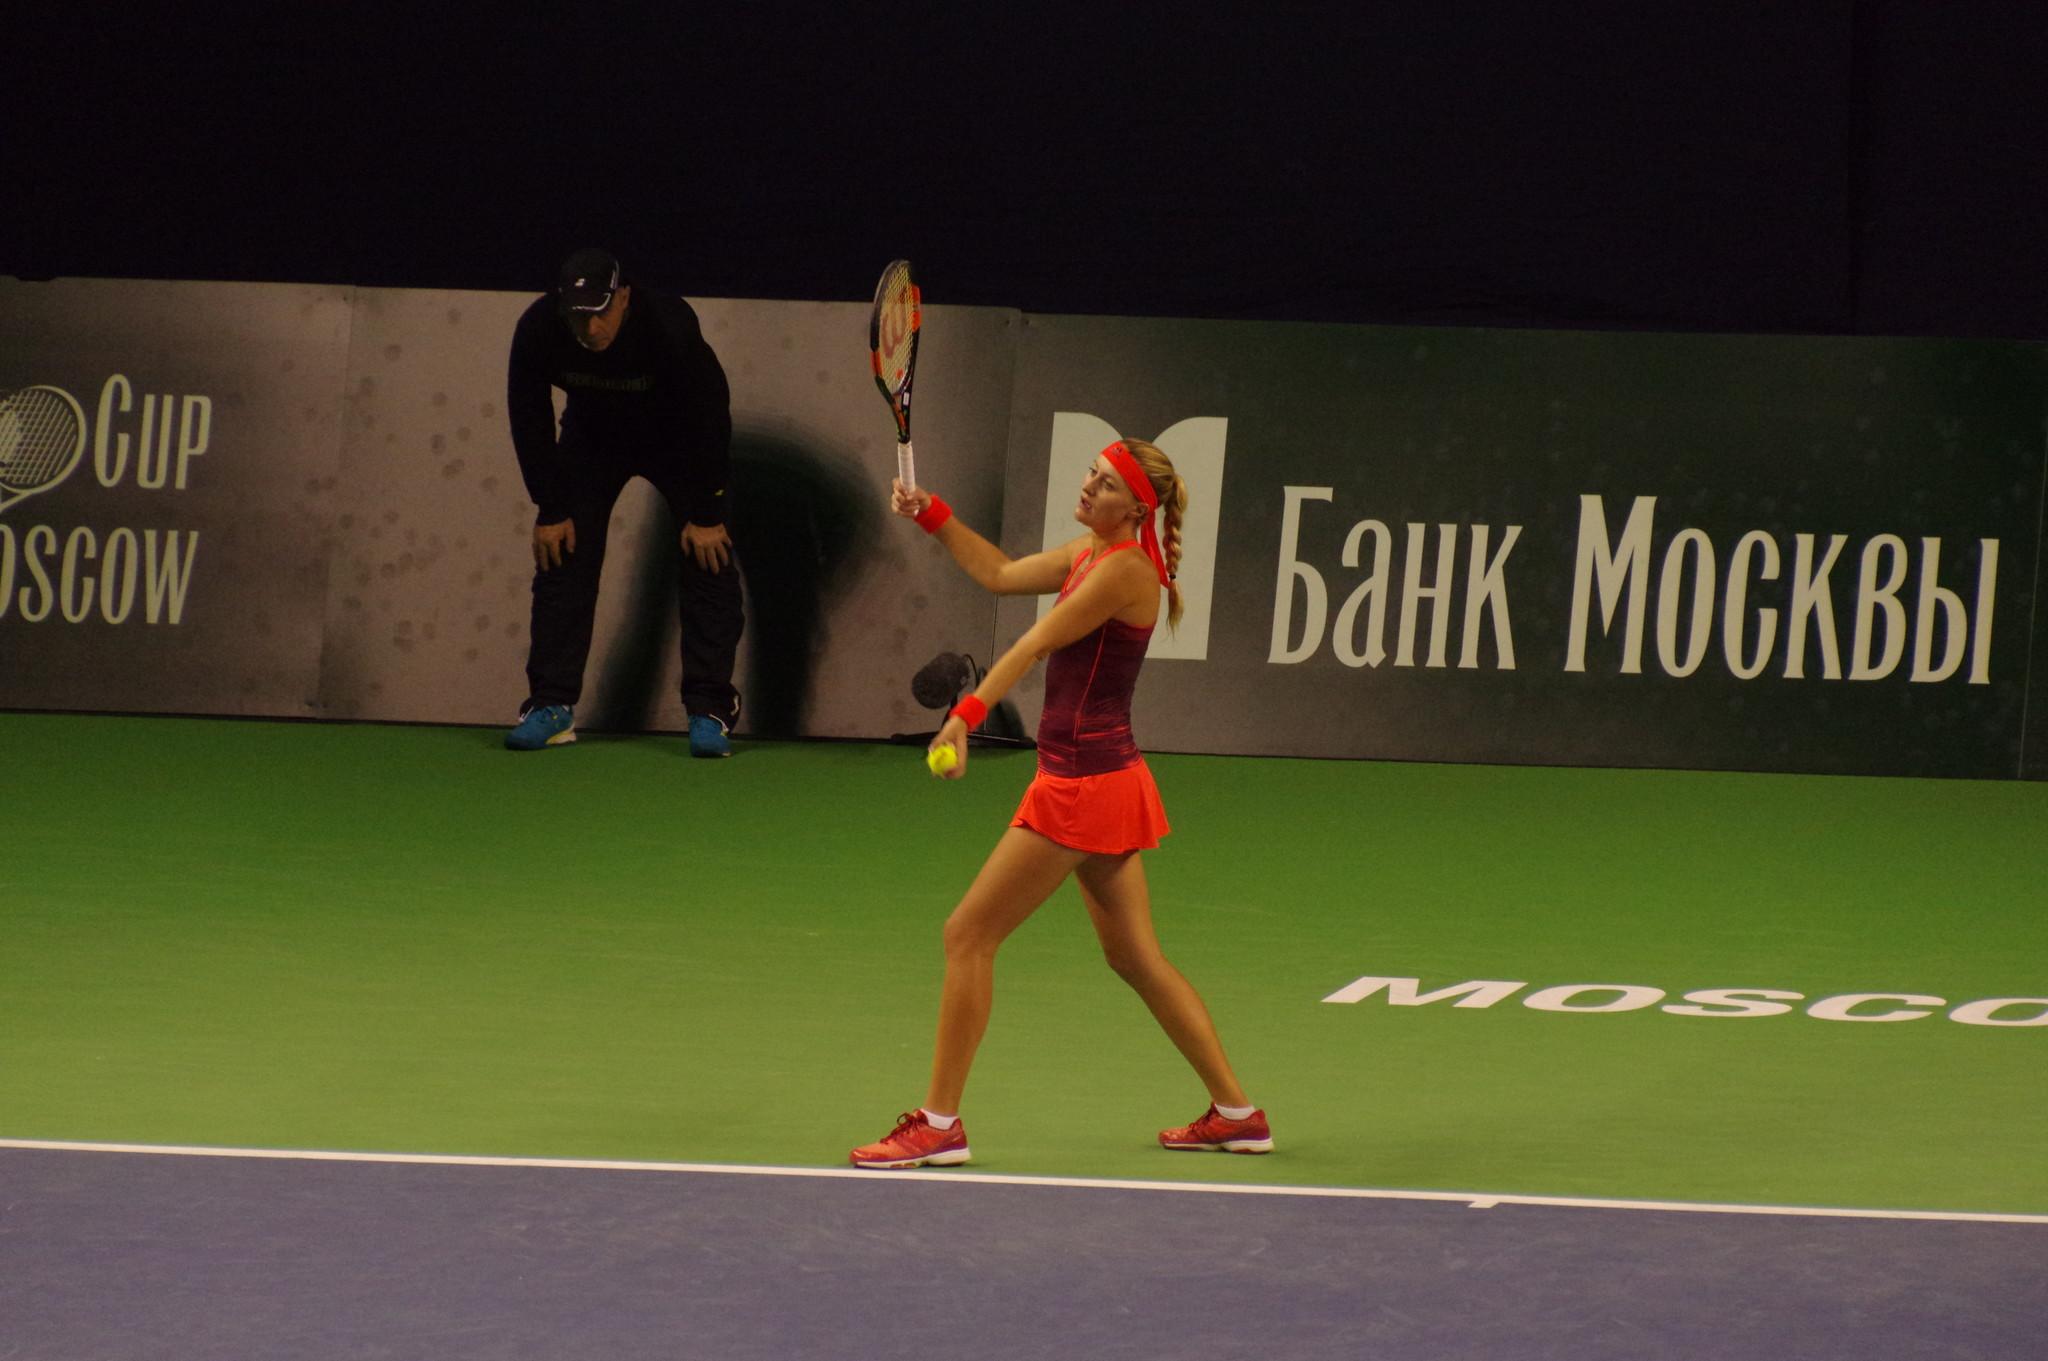 Кристина Младенович — французская теннисистка сербского происхождения